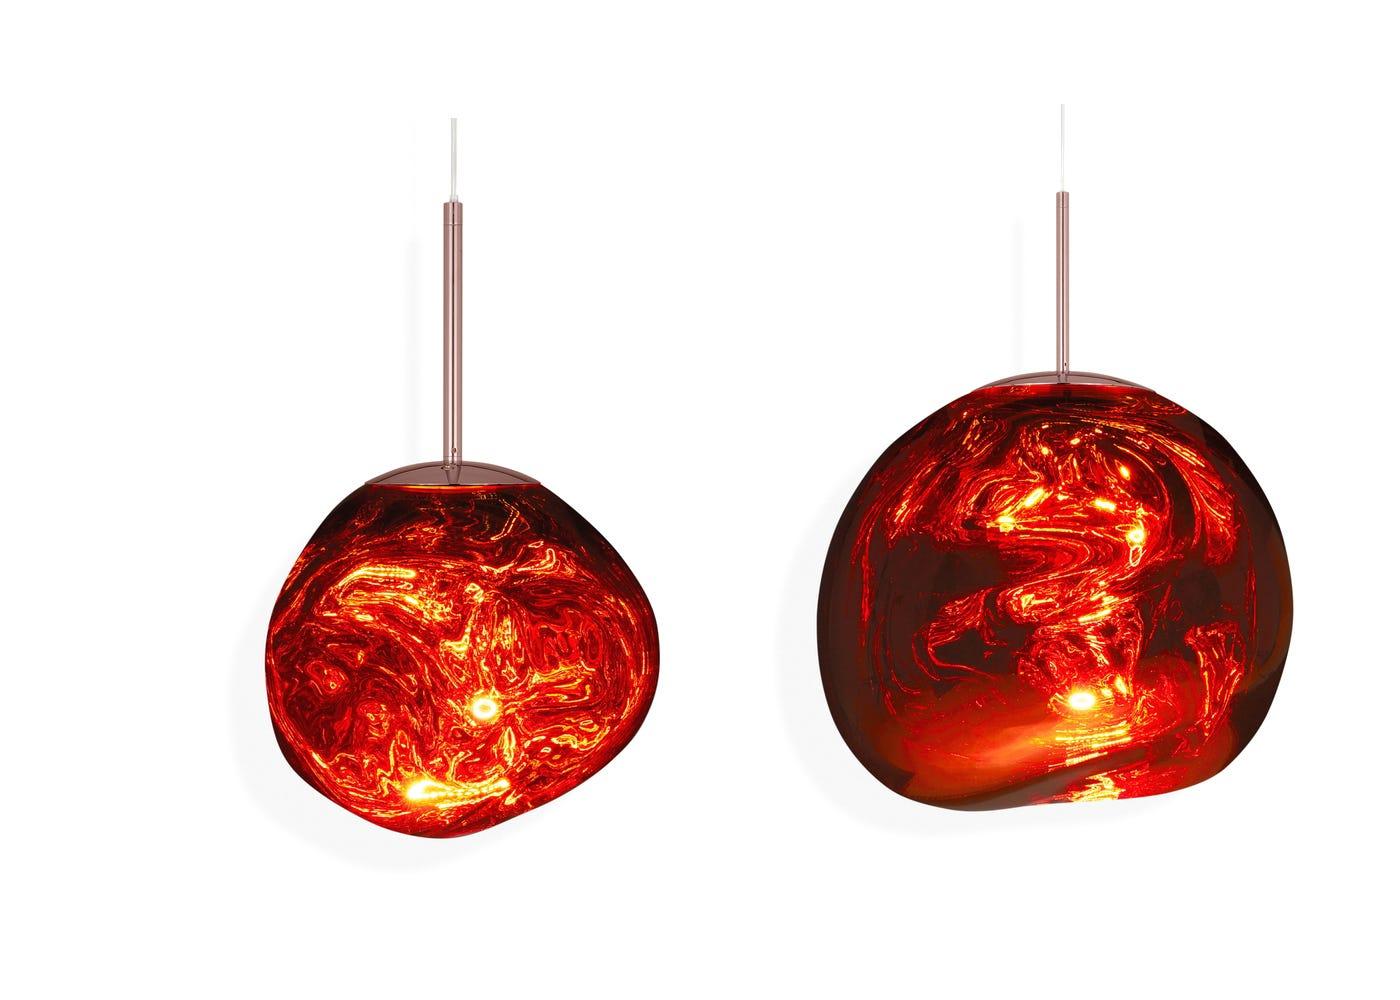 From left to right: Copper mini LED light on, Copper standard LED light on